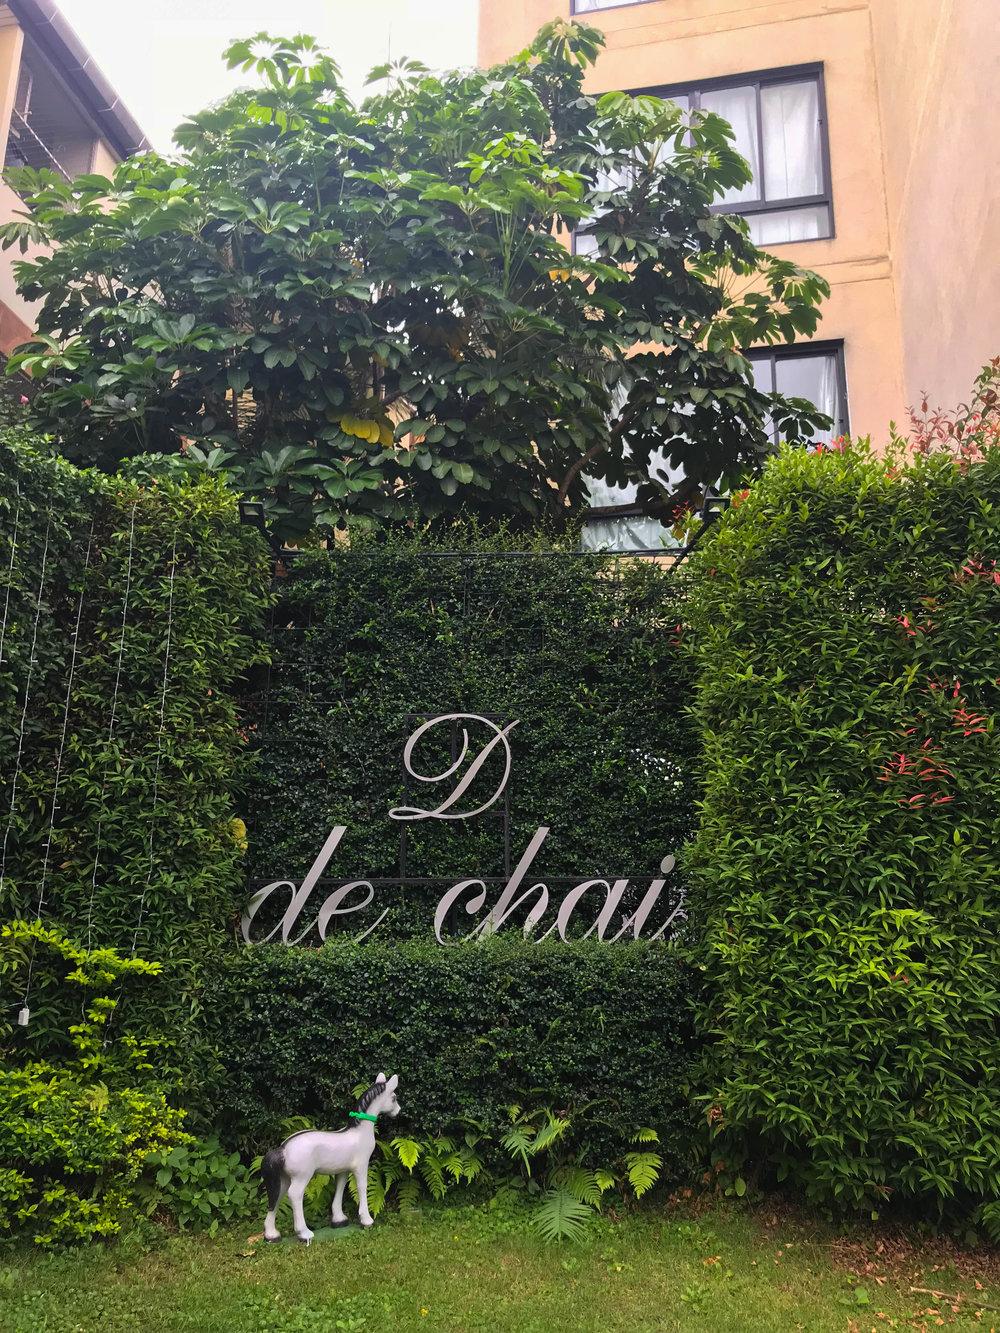 Thailand - Chiang Mai - De Chai Hotel - Front Entrance